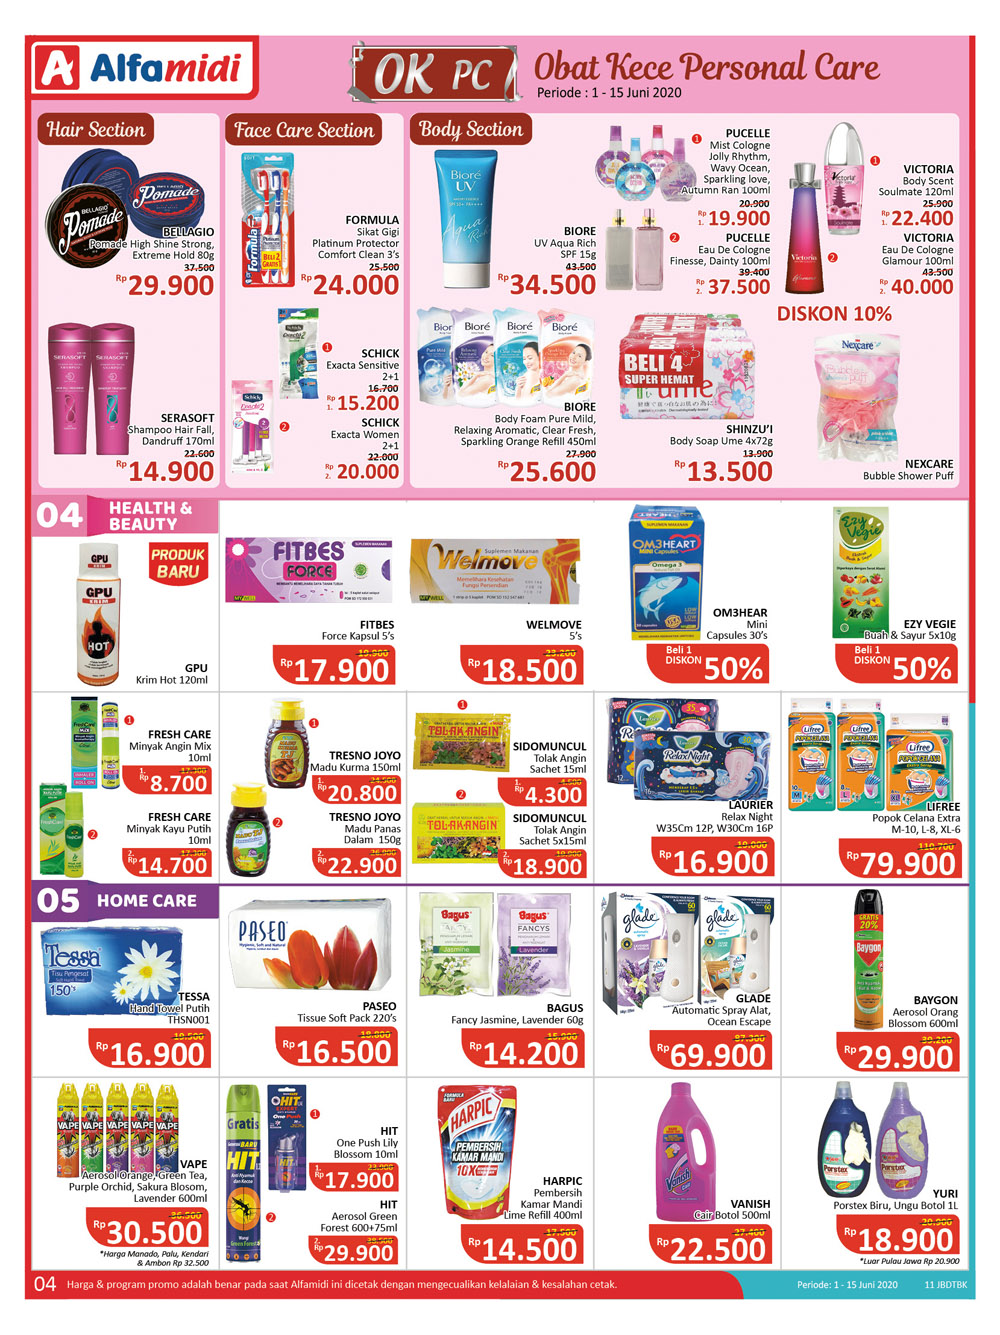 Promo Alfamidi Jsm Hari Ini Juni 2020 Katalog Promo Alfamidi Weekday Mamikos Info